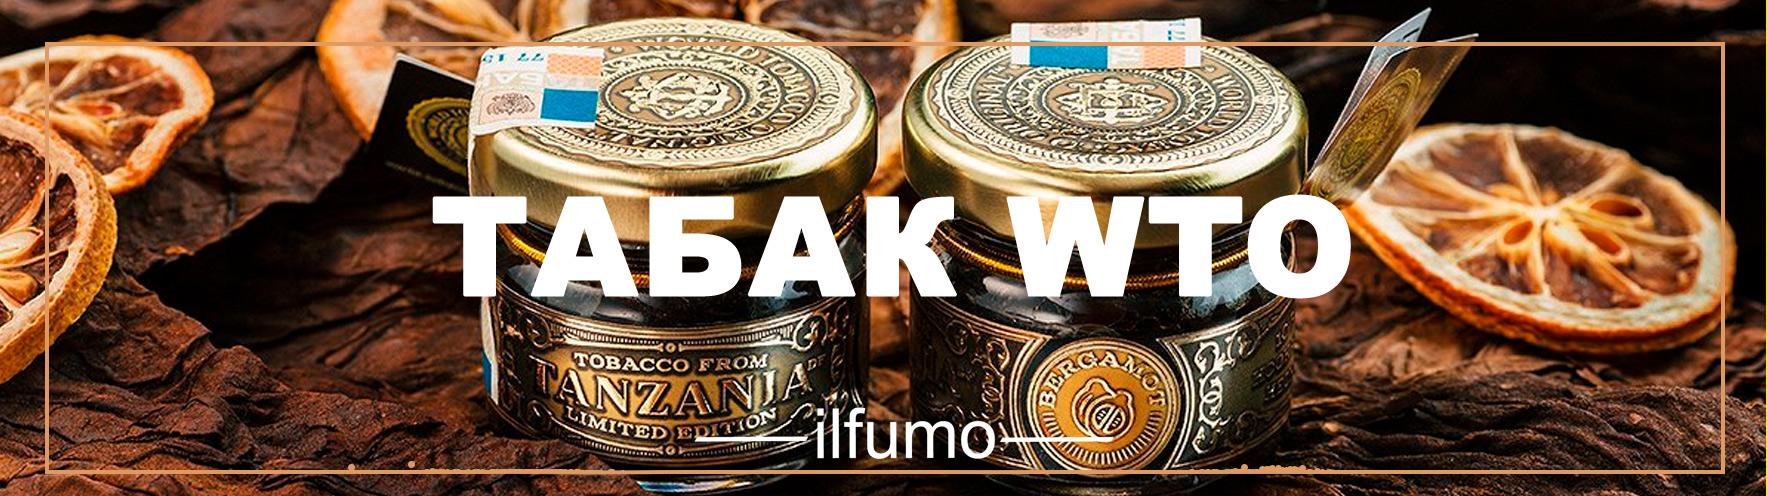 tabak wto - Табак для кальяна WTO